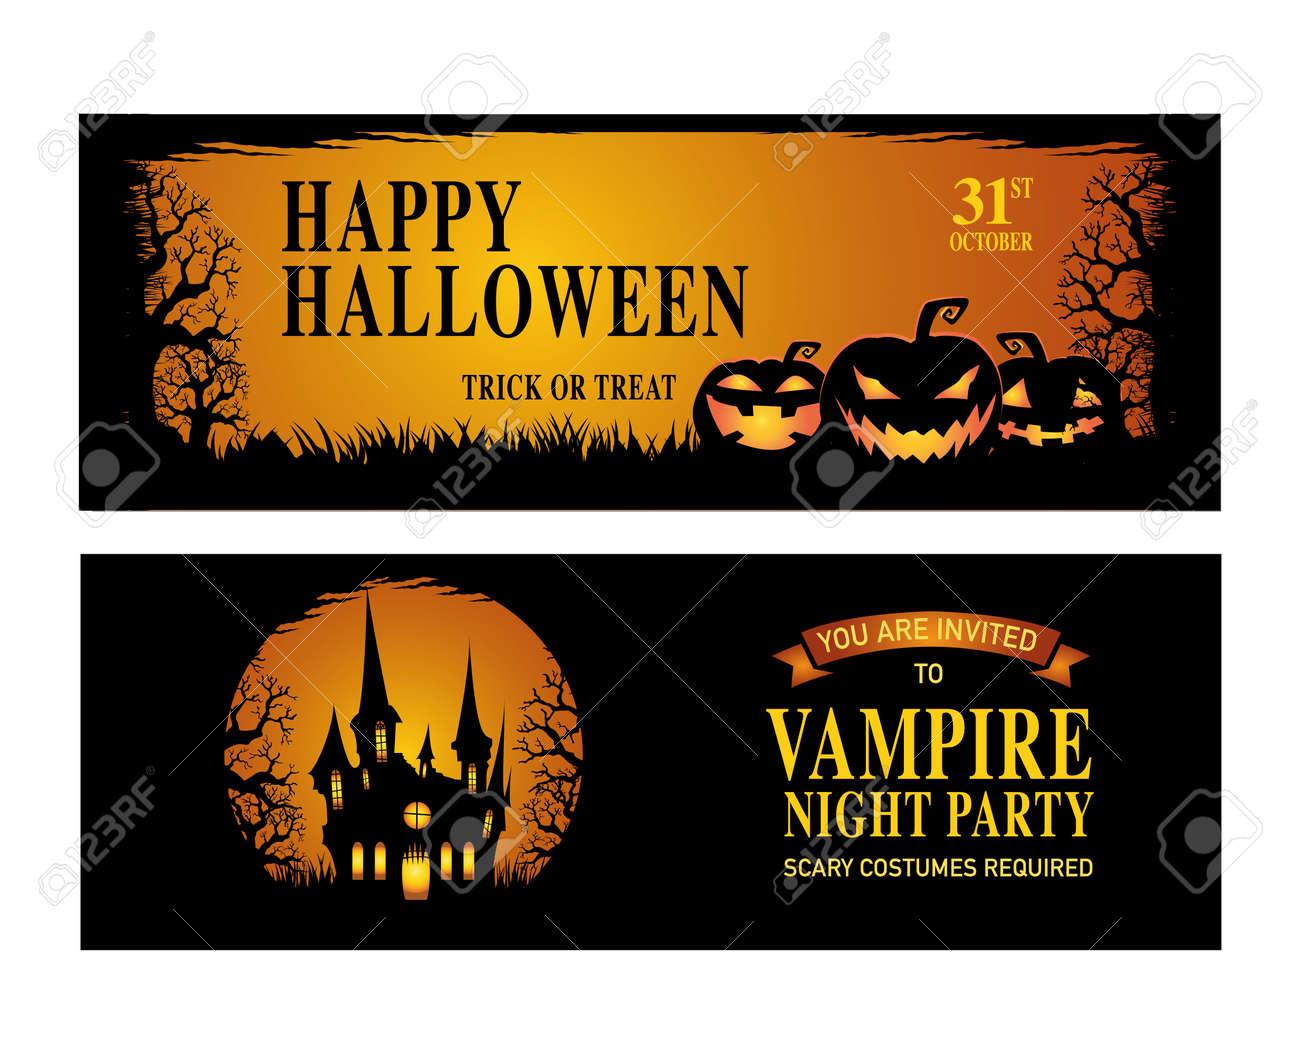 Halloween Party. Happy Halloween. Vector Illustration. Stock